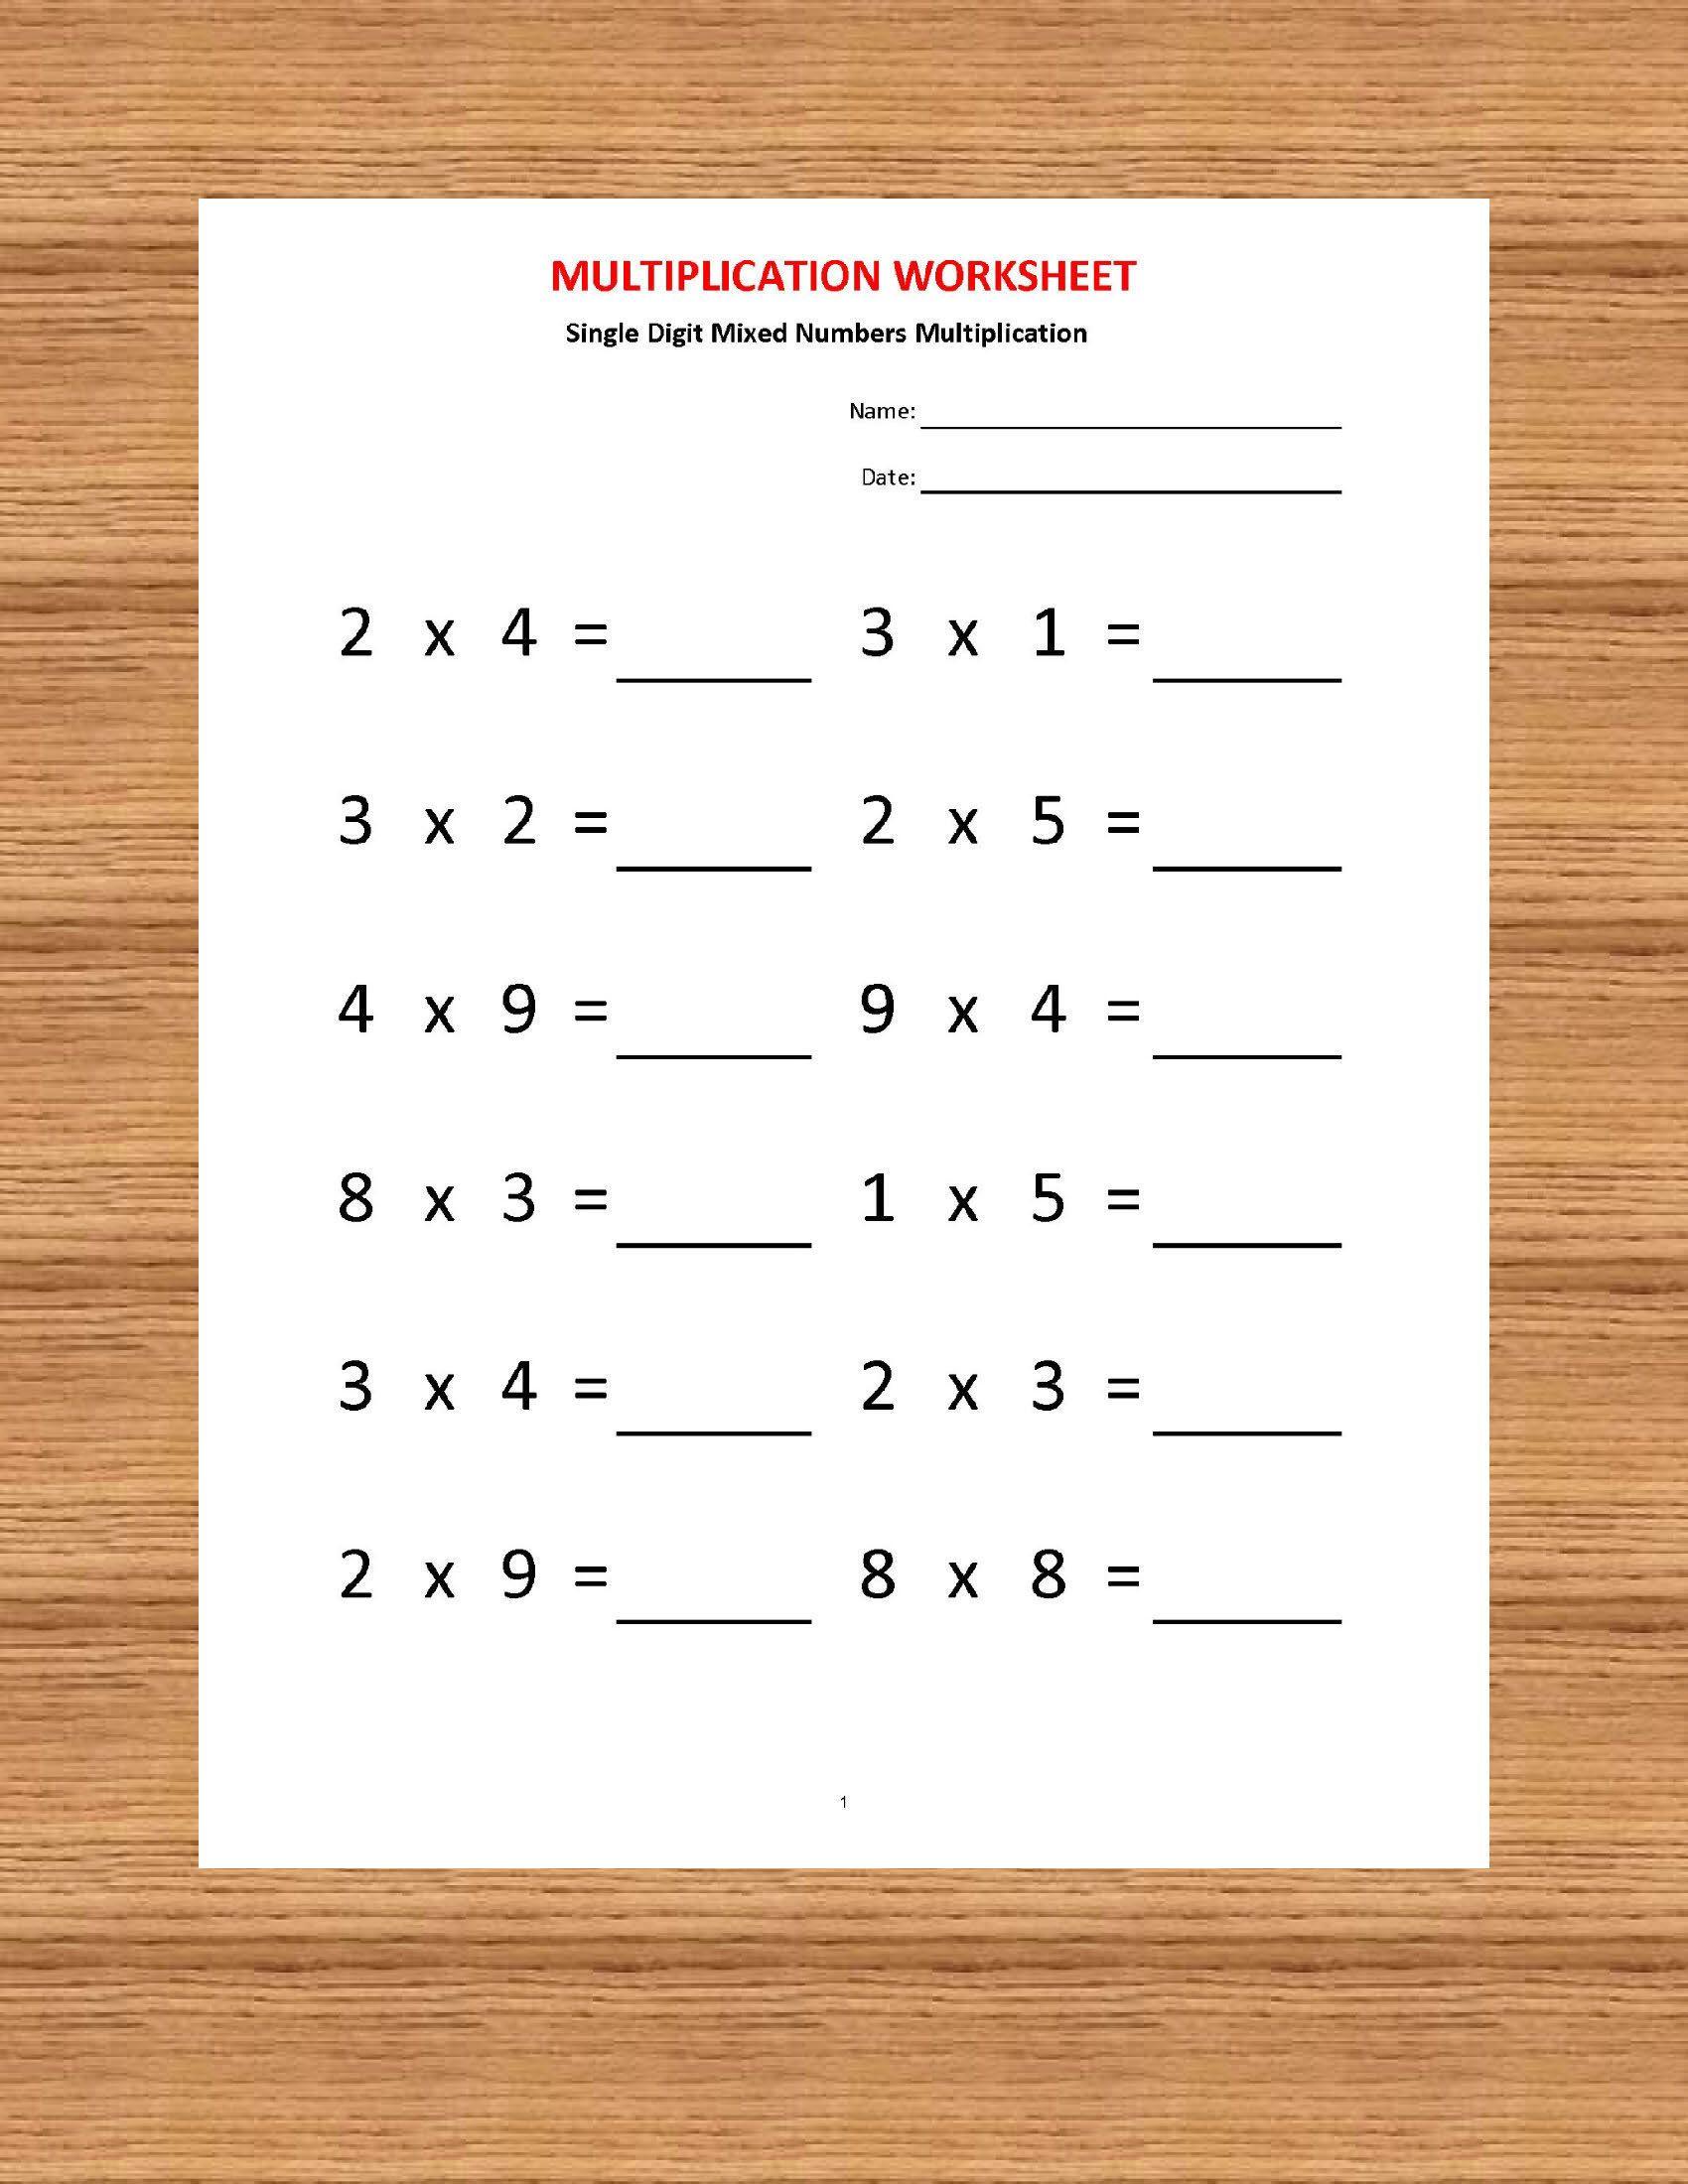 Worksheets On Multiplication For Grade 2